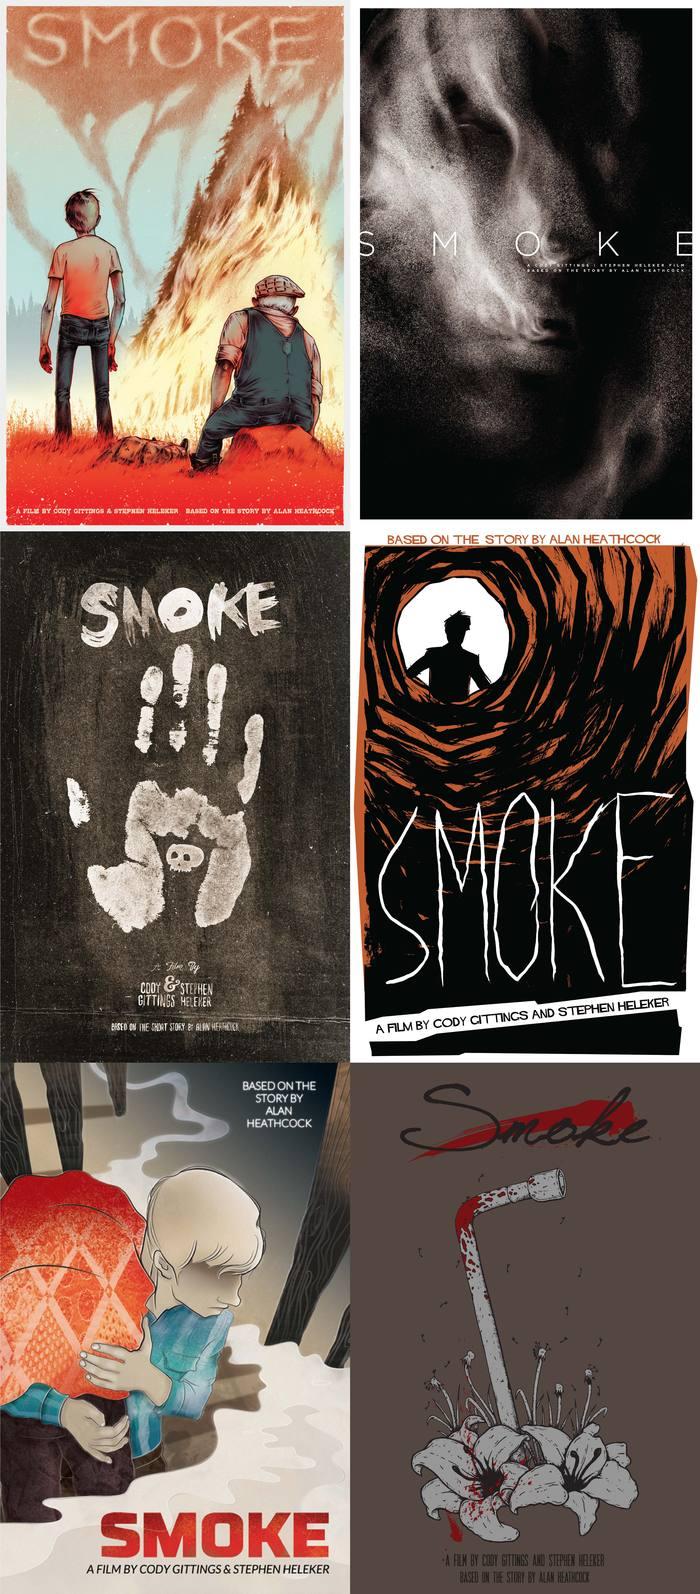 Original artwork designed by Erin Ruiz, Adam Rosenlund, Conrad Garner, Chris Hunt, Tiffanie Hsu, and Beau Van Greener (from top-left)